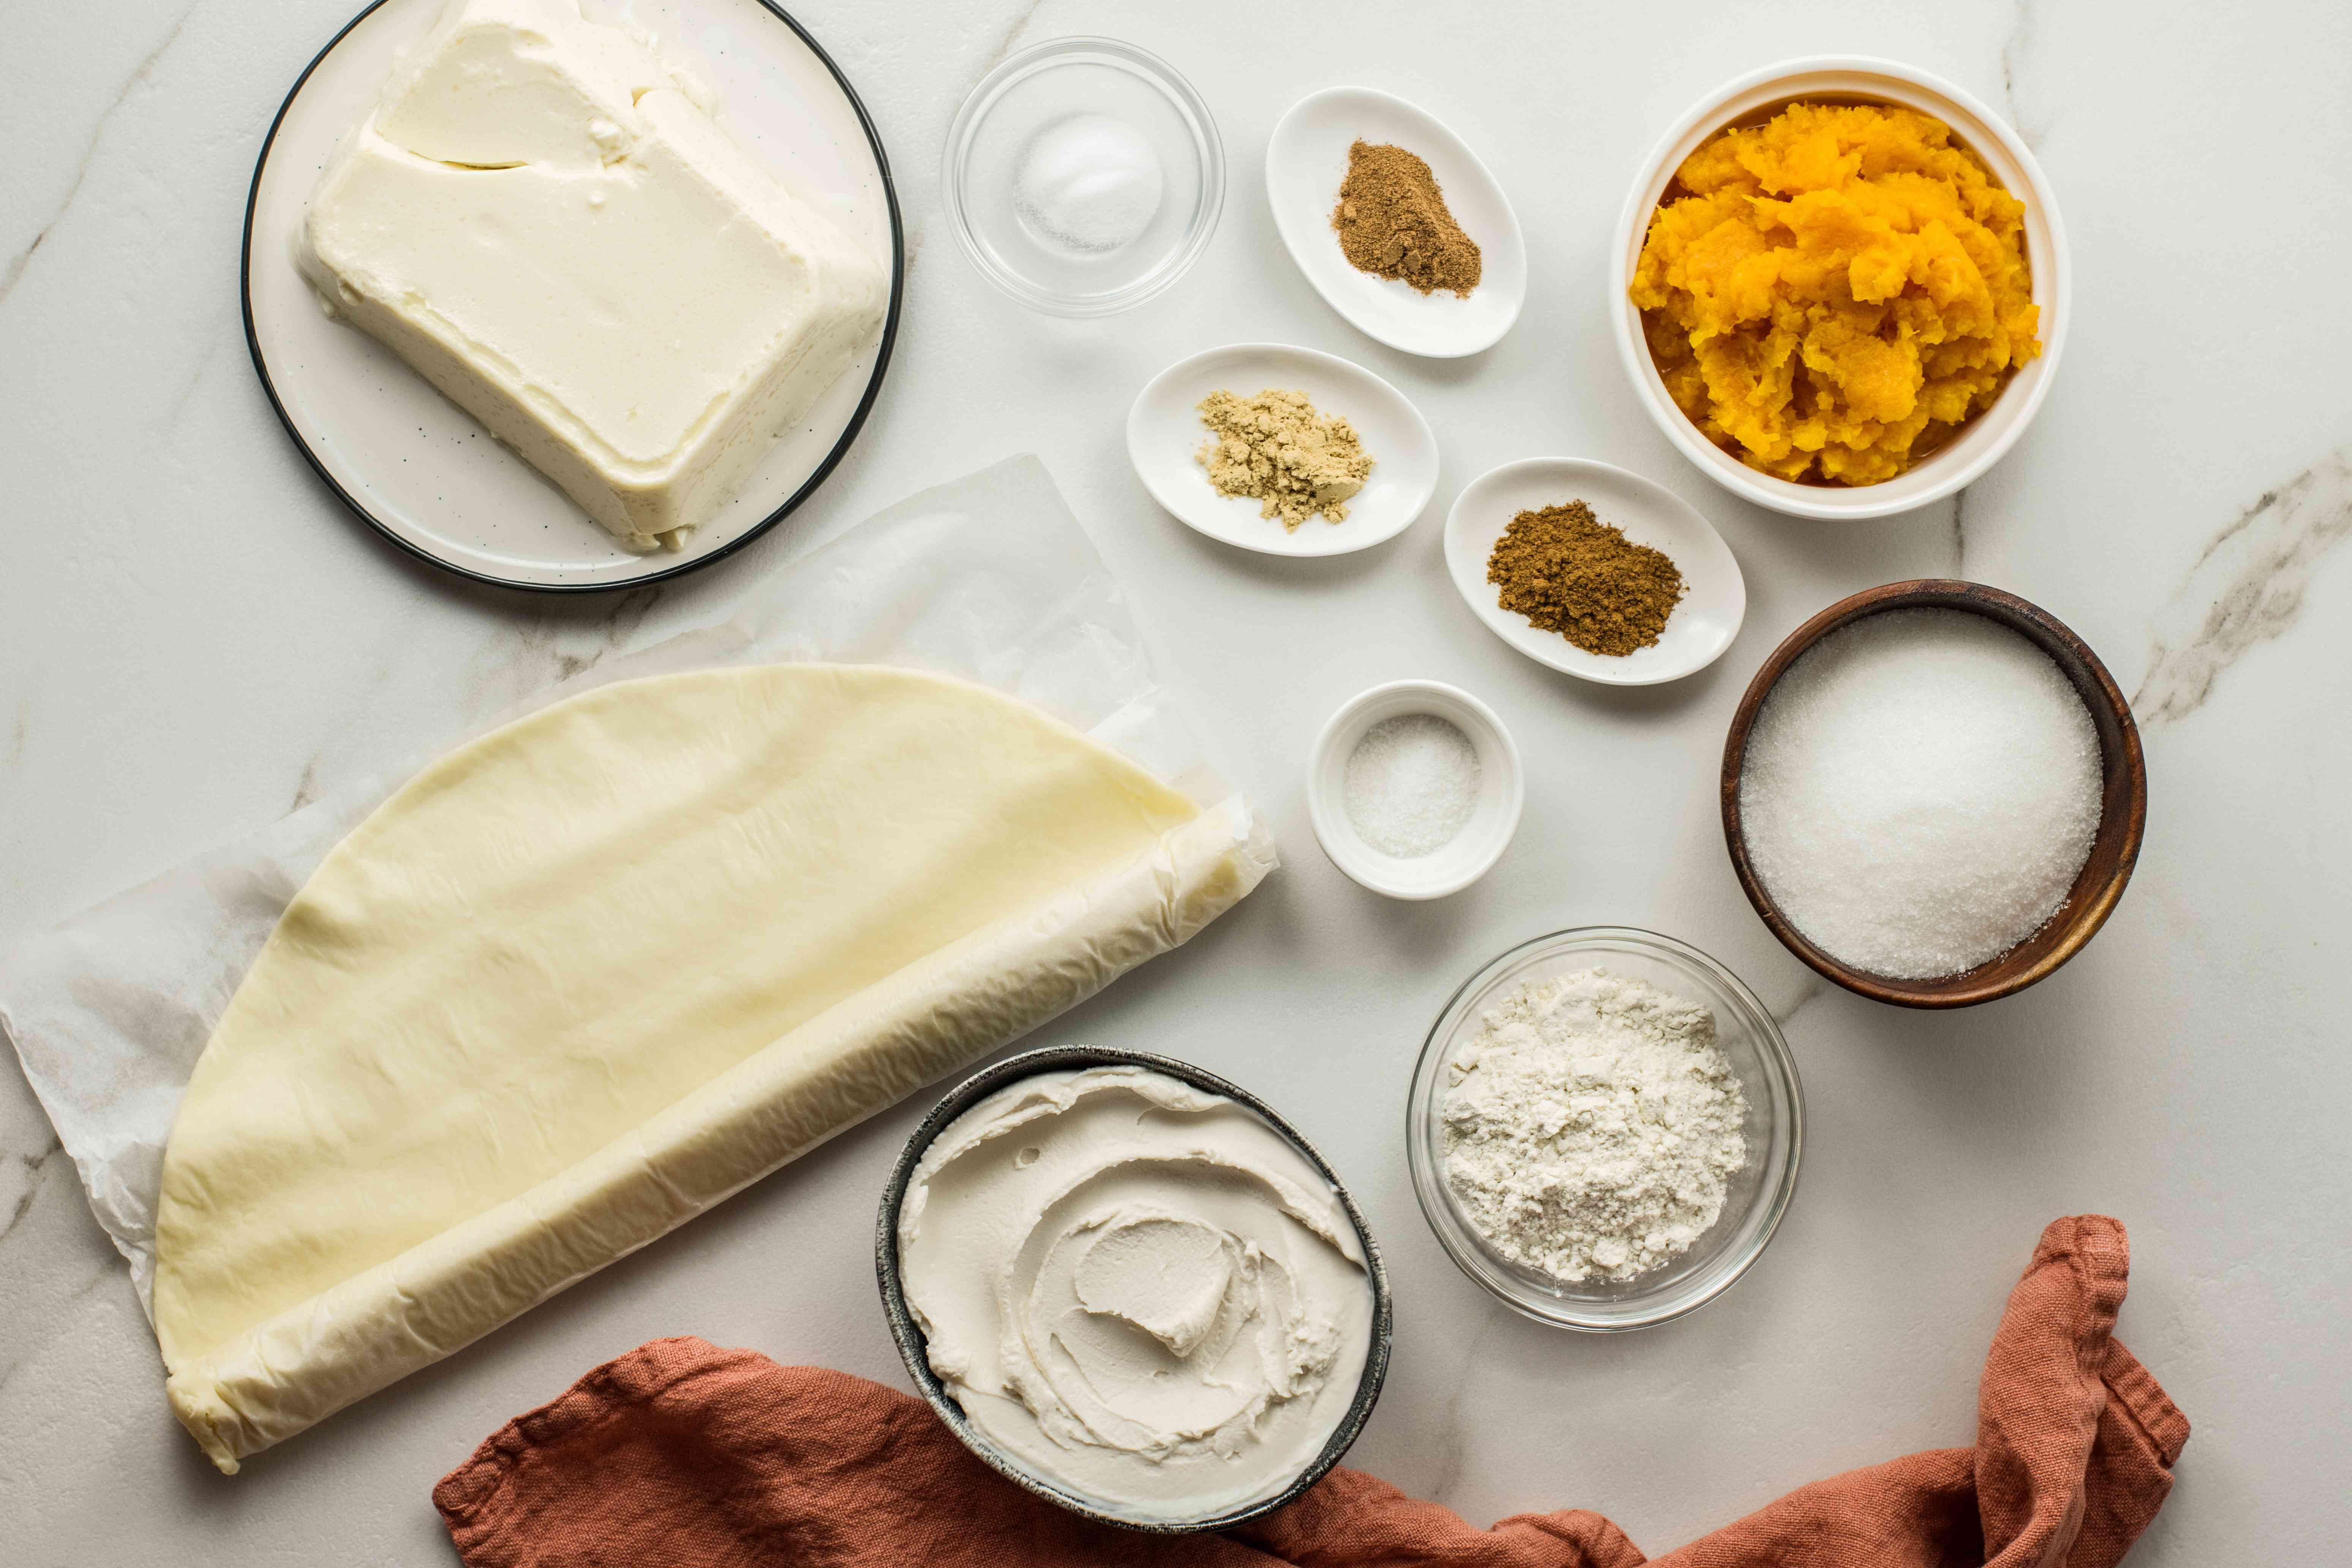 Ingredients for vegan pumpkin cheesecake